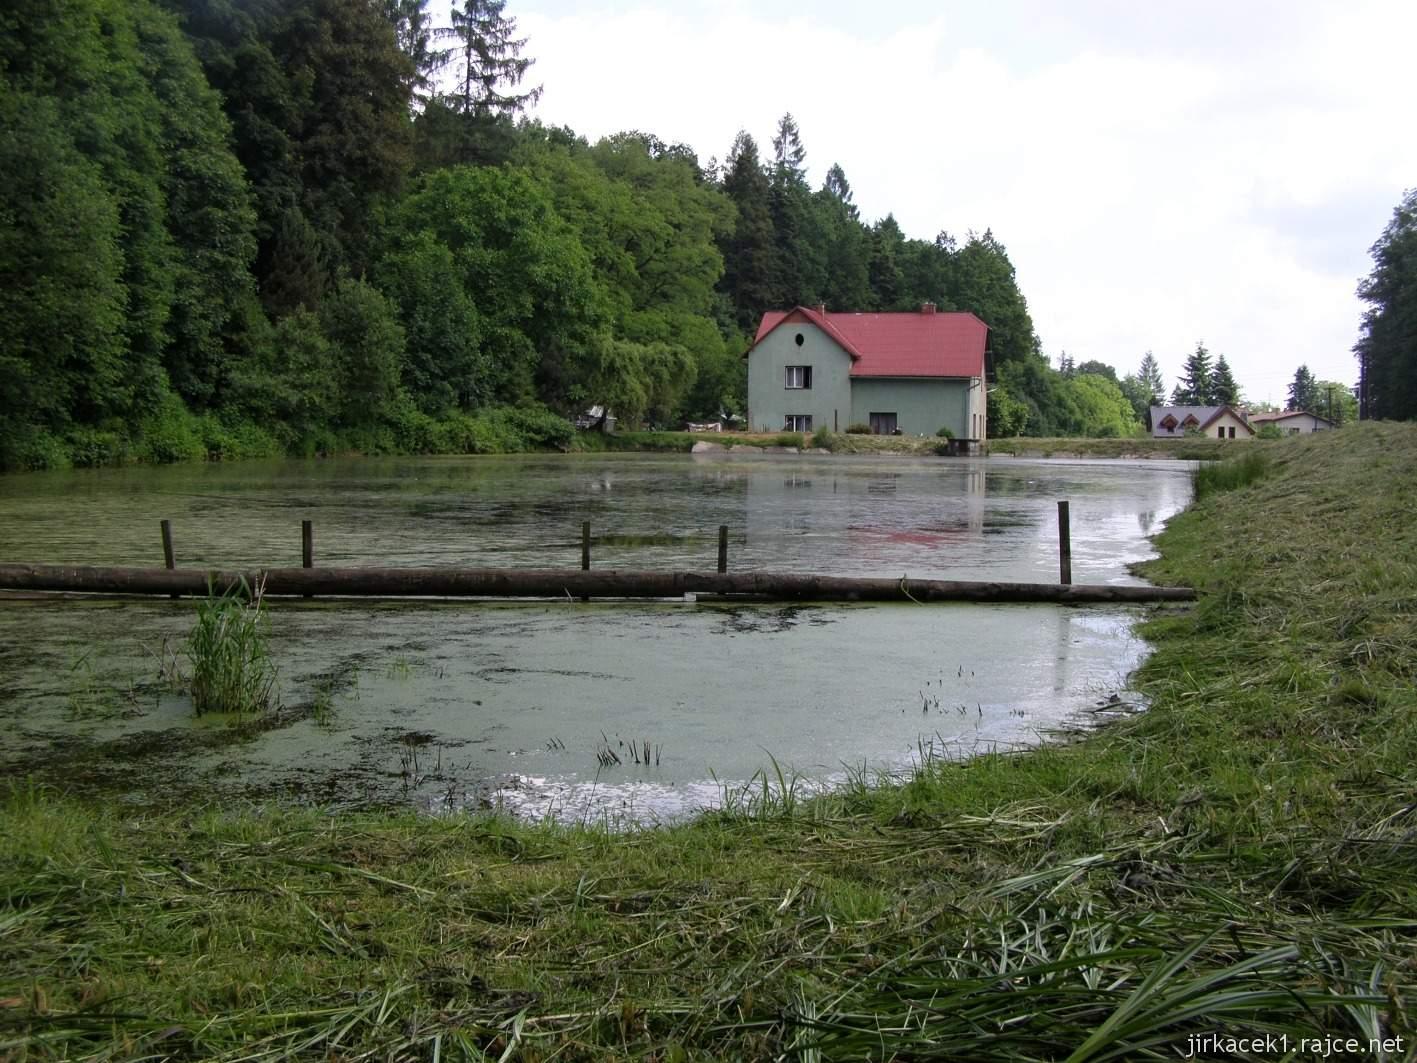 Chabičov ve Slezsku - Dračí mlýn Na Valše